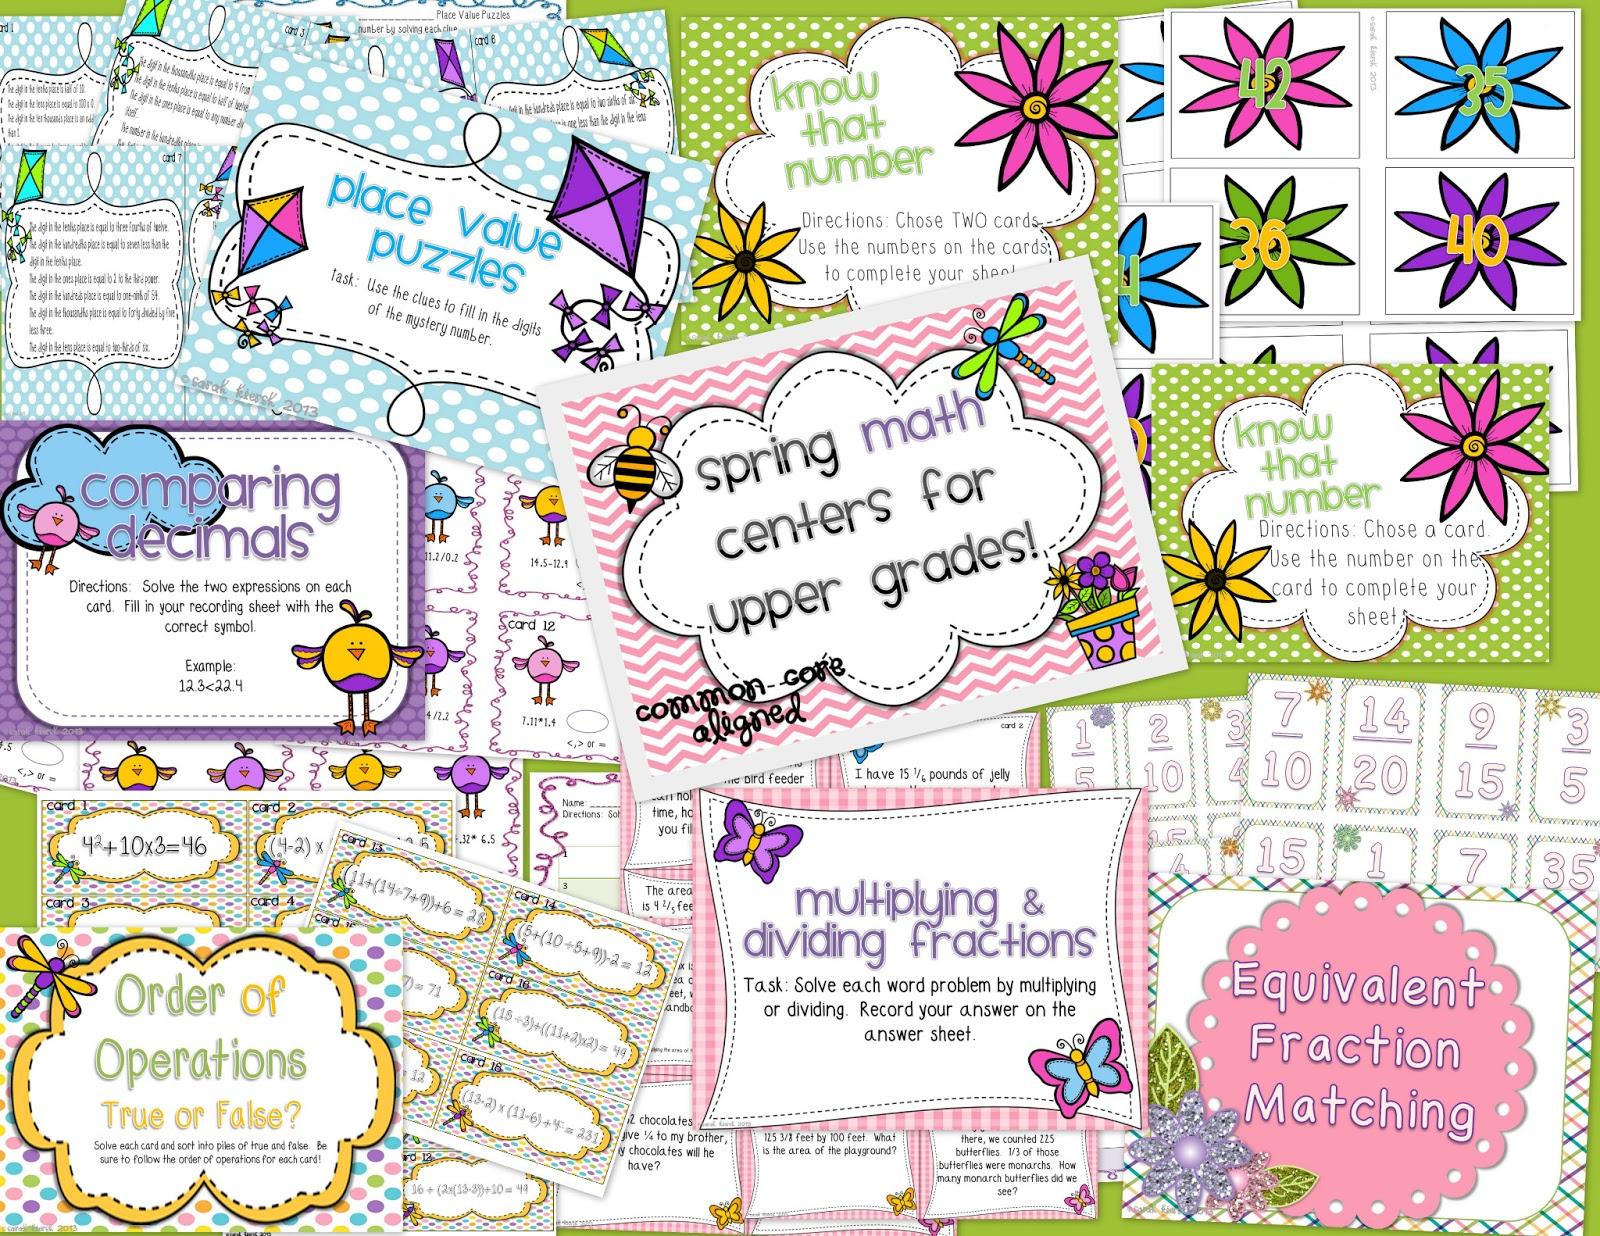 medium resolution of Superstar Math Worksheet   Printable Worksheets and Activities for  Teachers